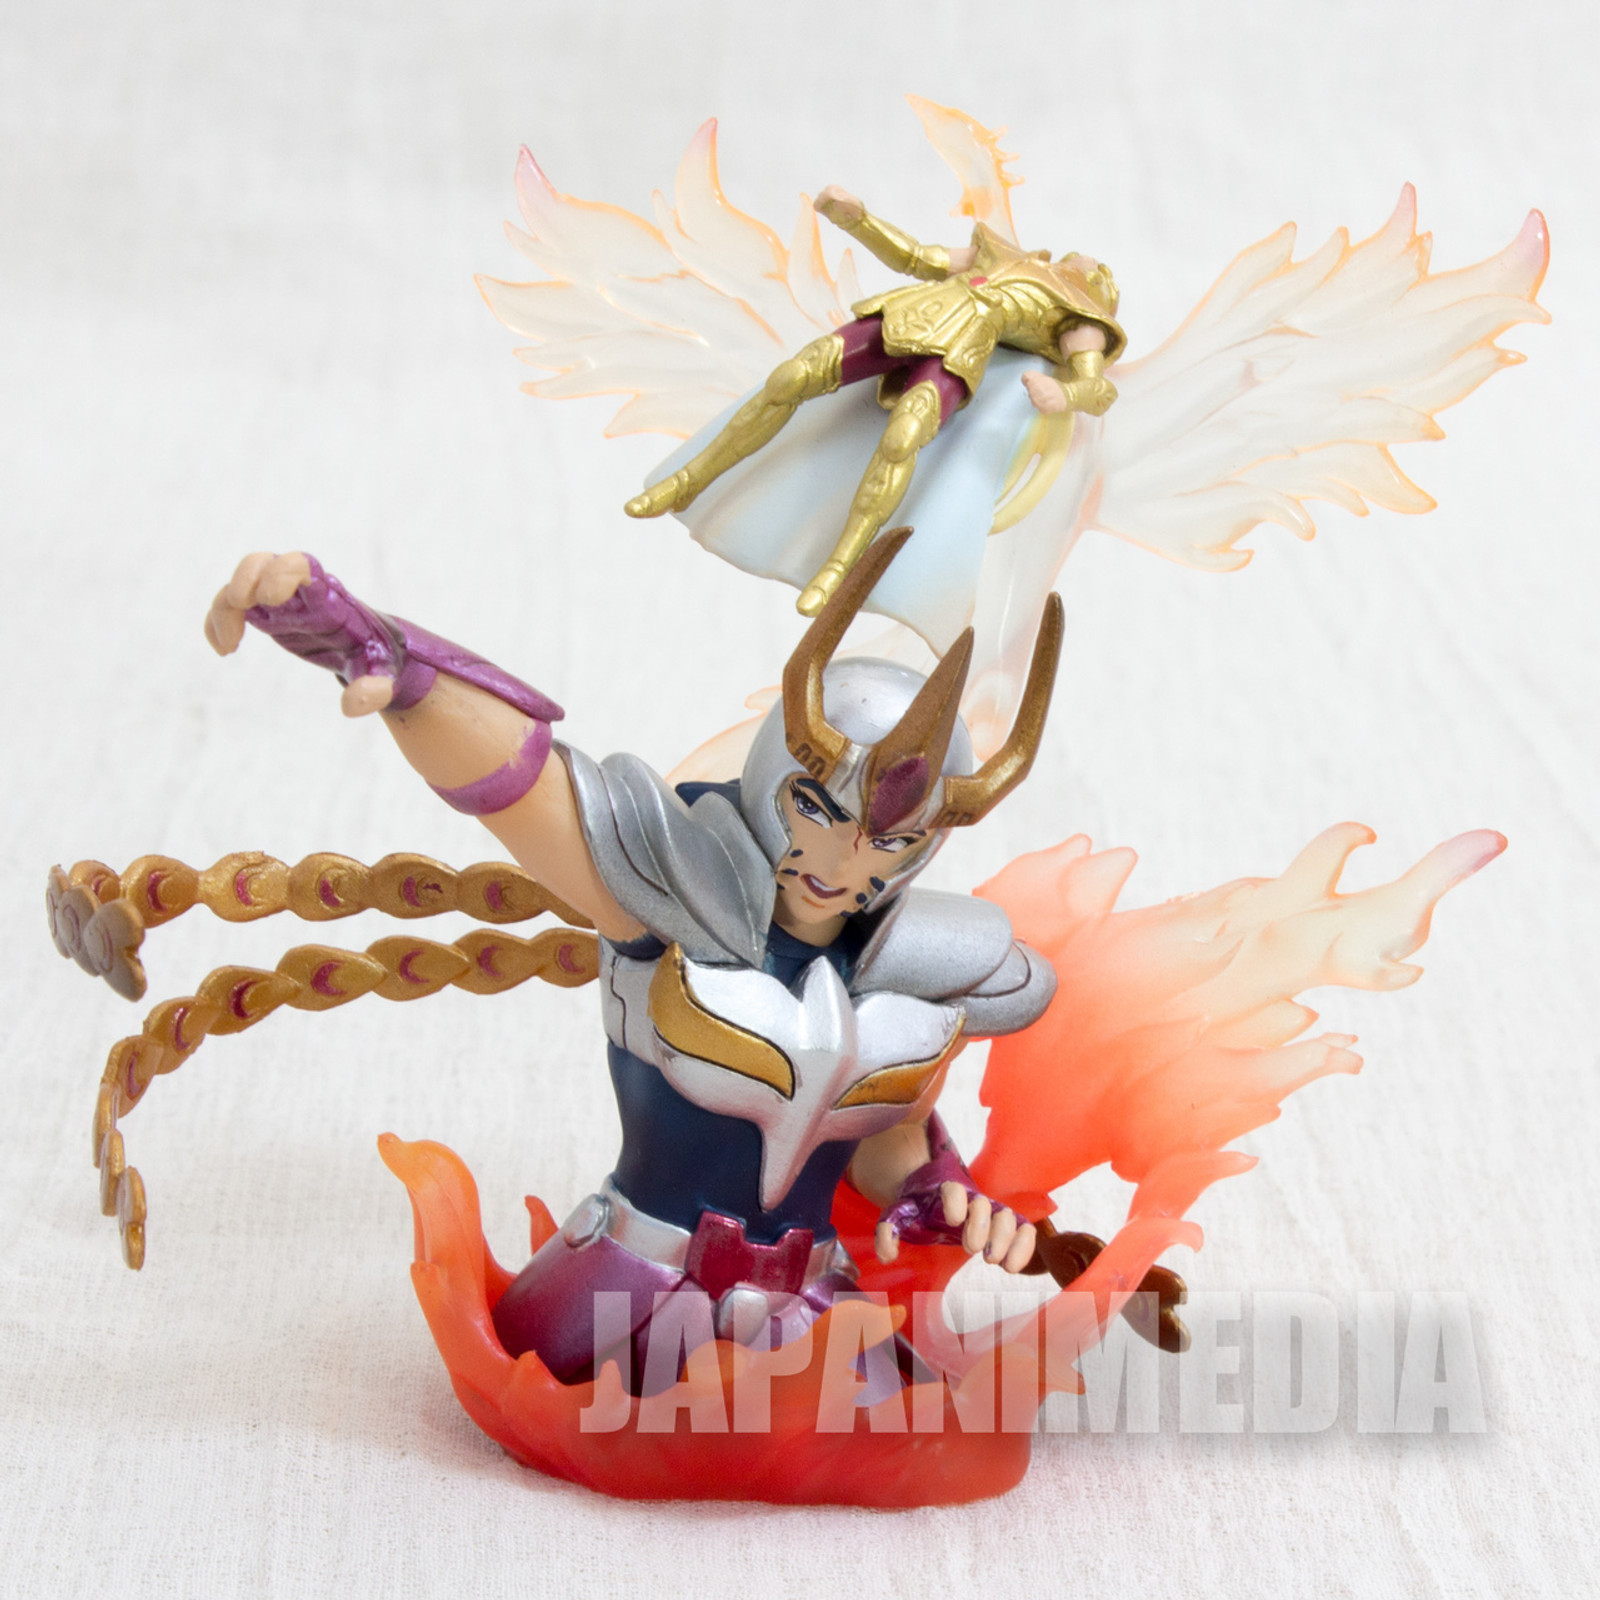 Saint Seiya Diorama Figure Phoenix Ikki VS Virgo Shaka Megahouse JAPAN